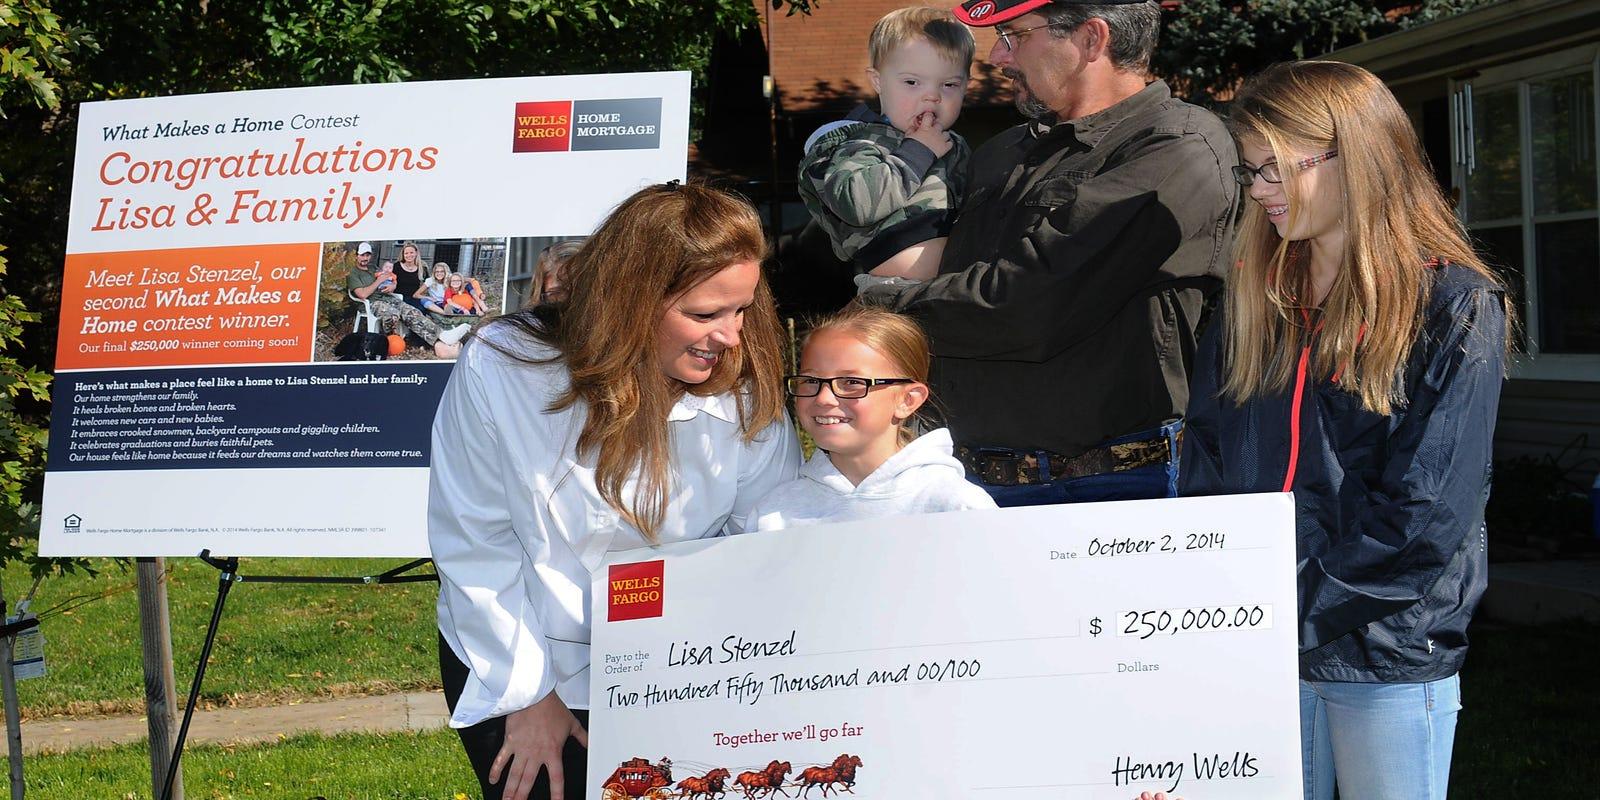 Timnath woman wins $250,000 from Wells Fargo